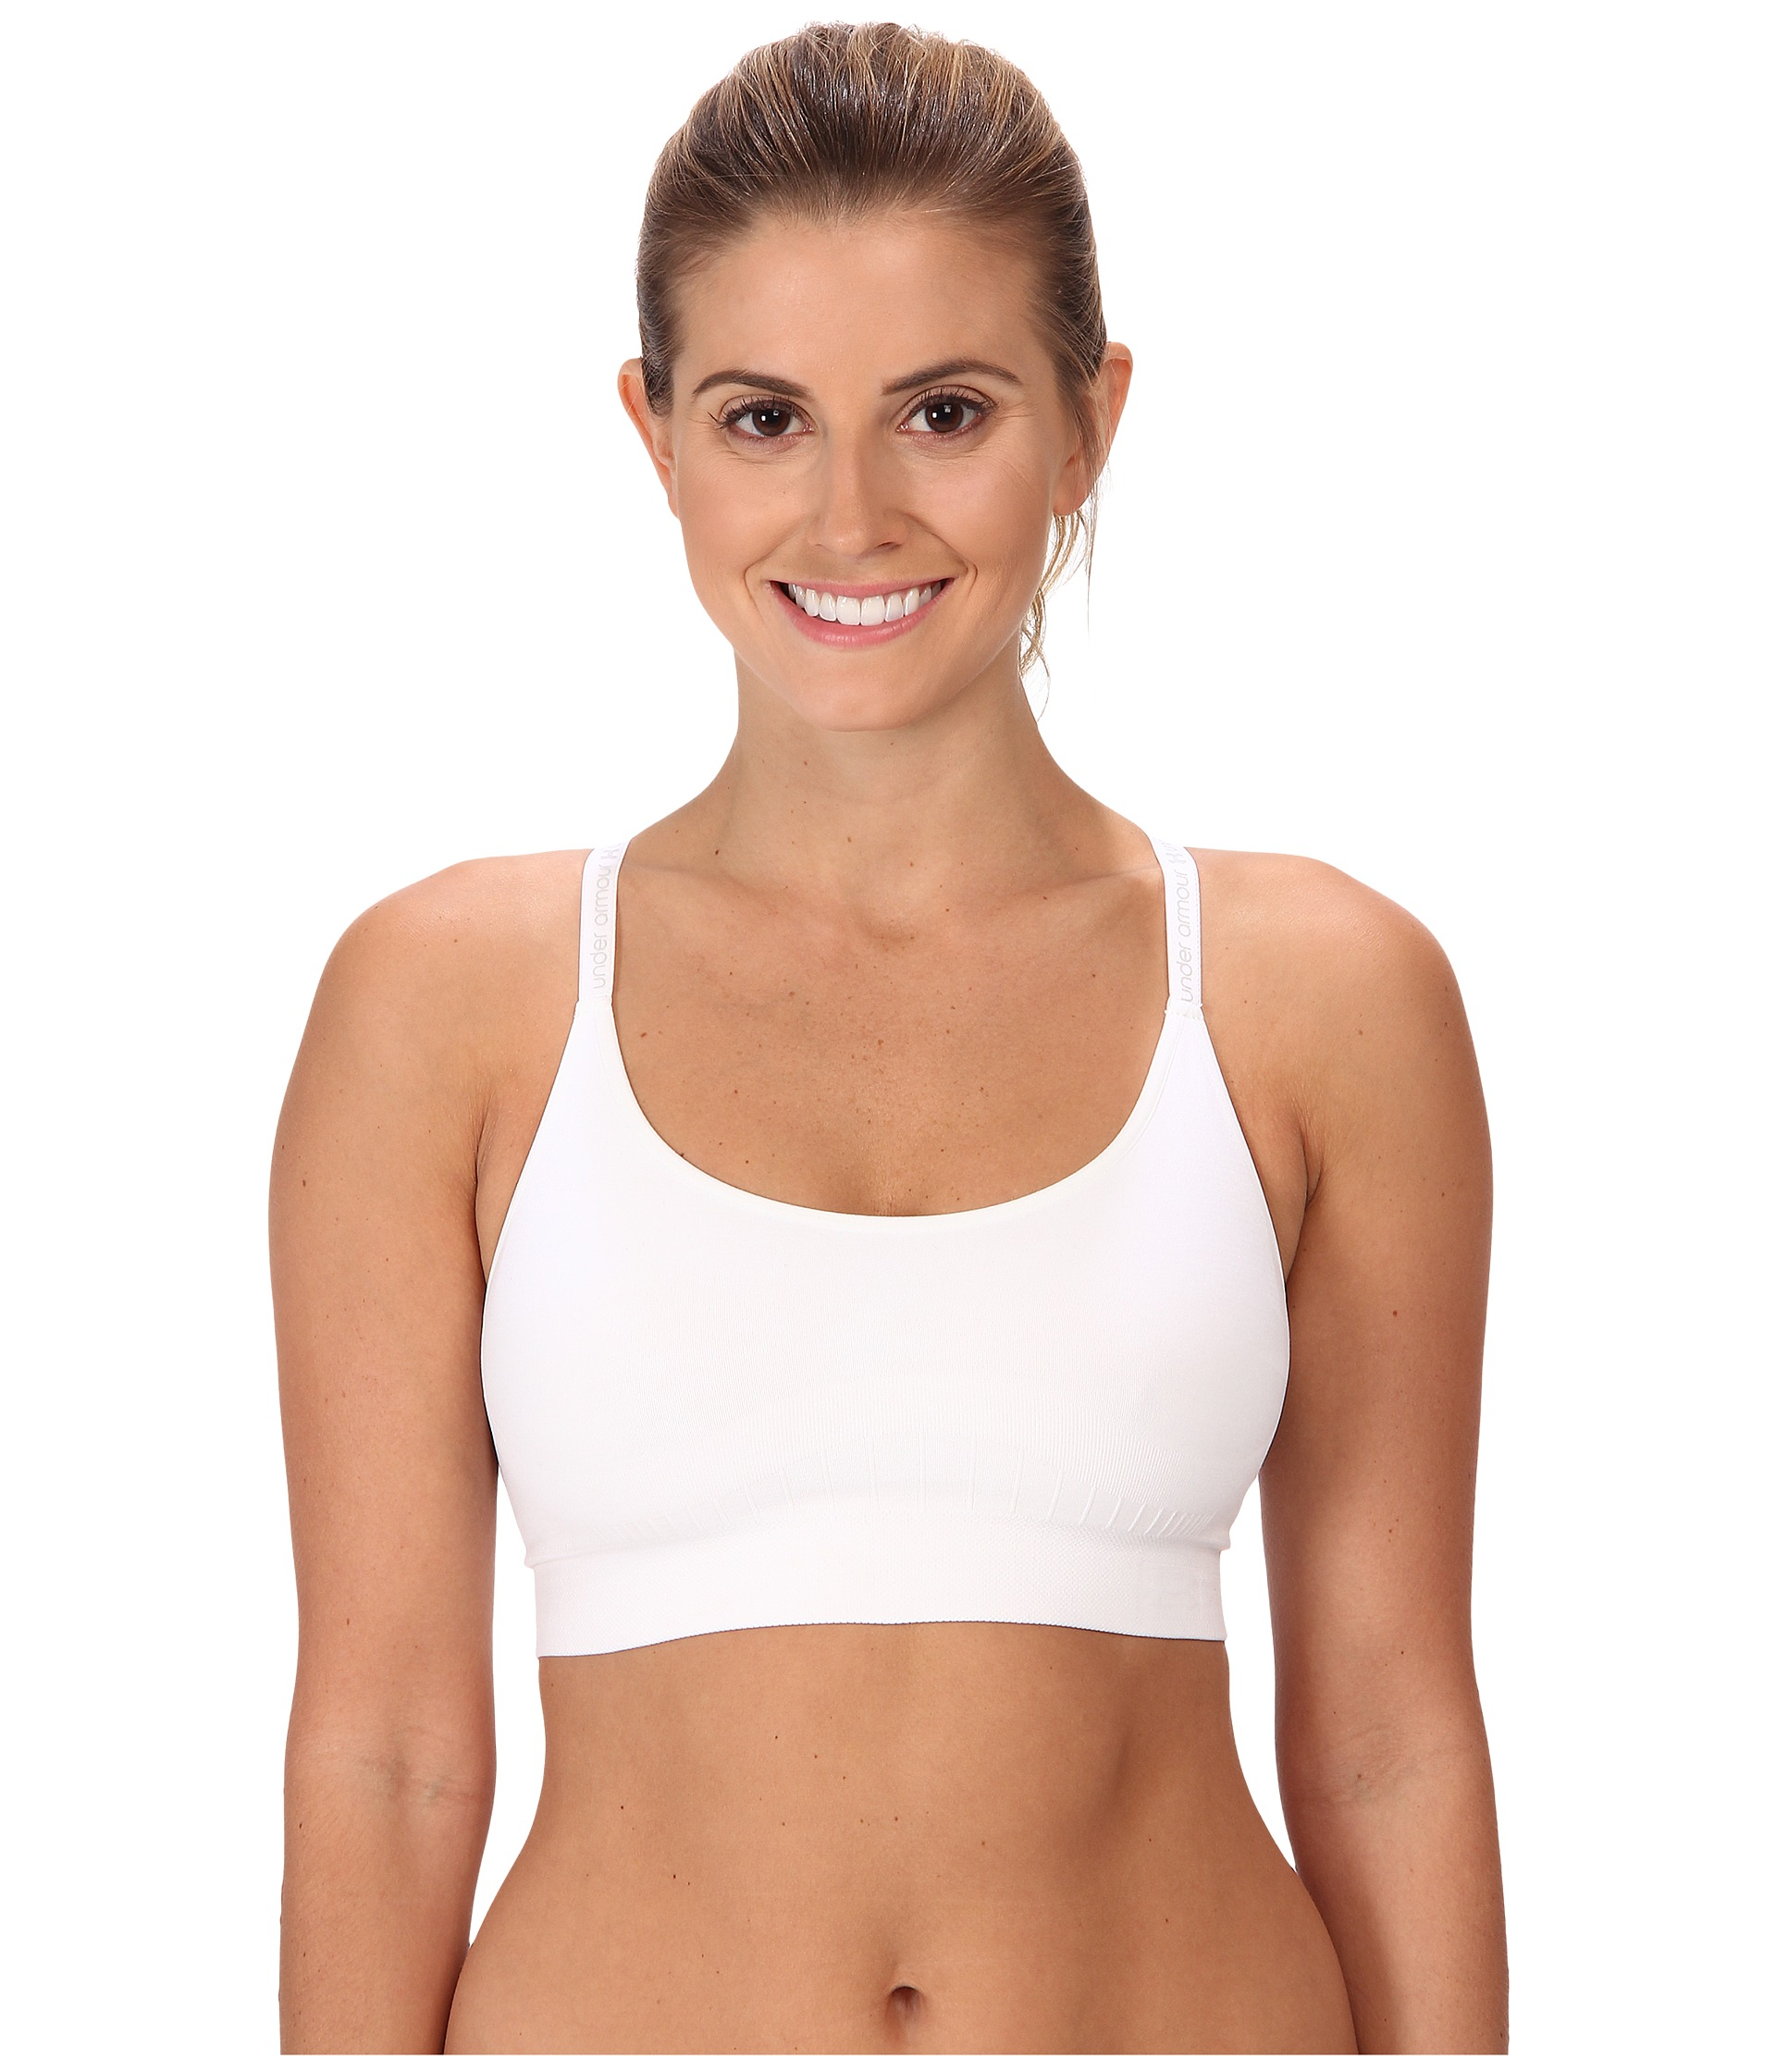 995c366751 Under Armour Seamless Essential Sports Bra White White on PopScreen